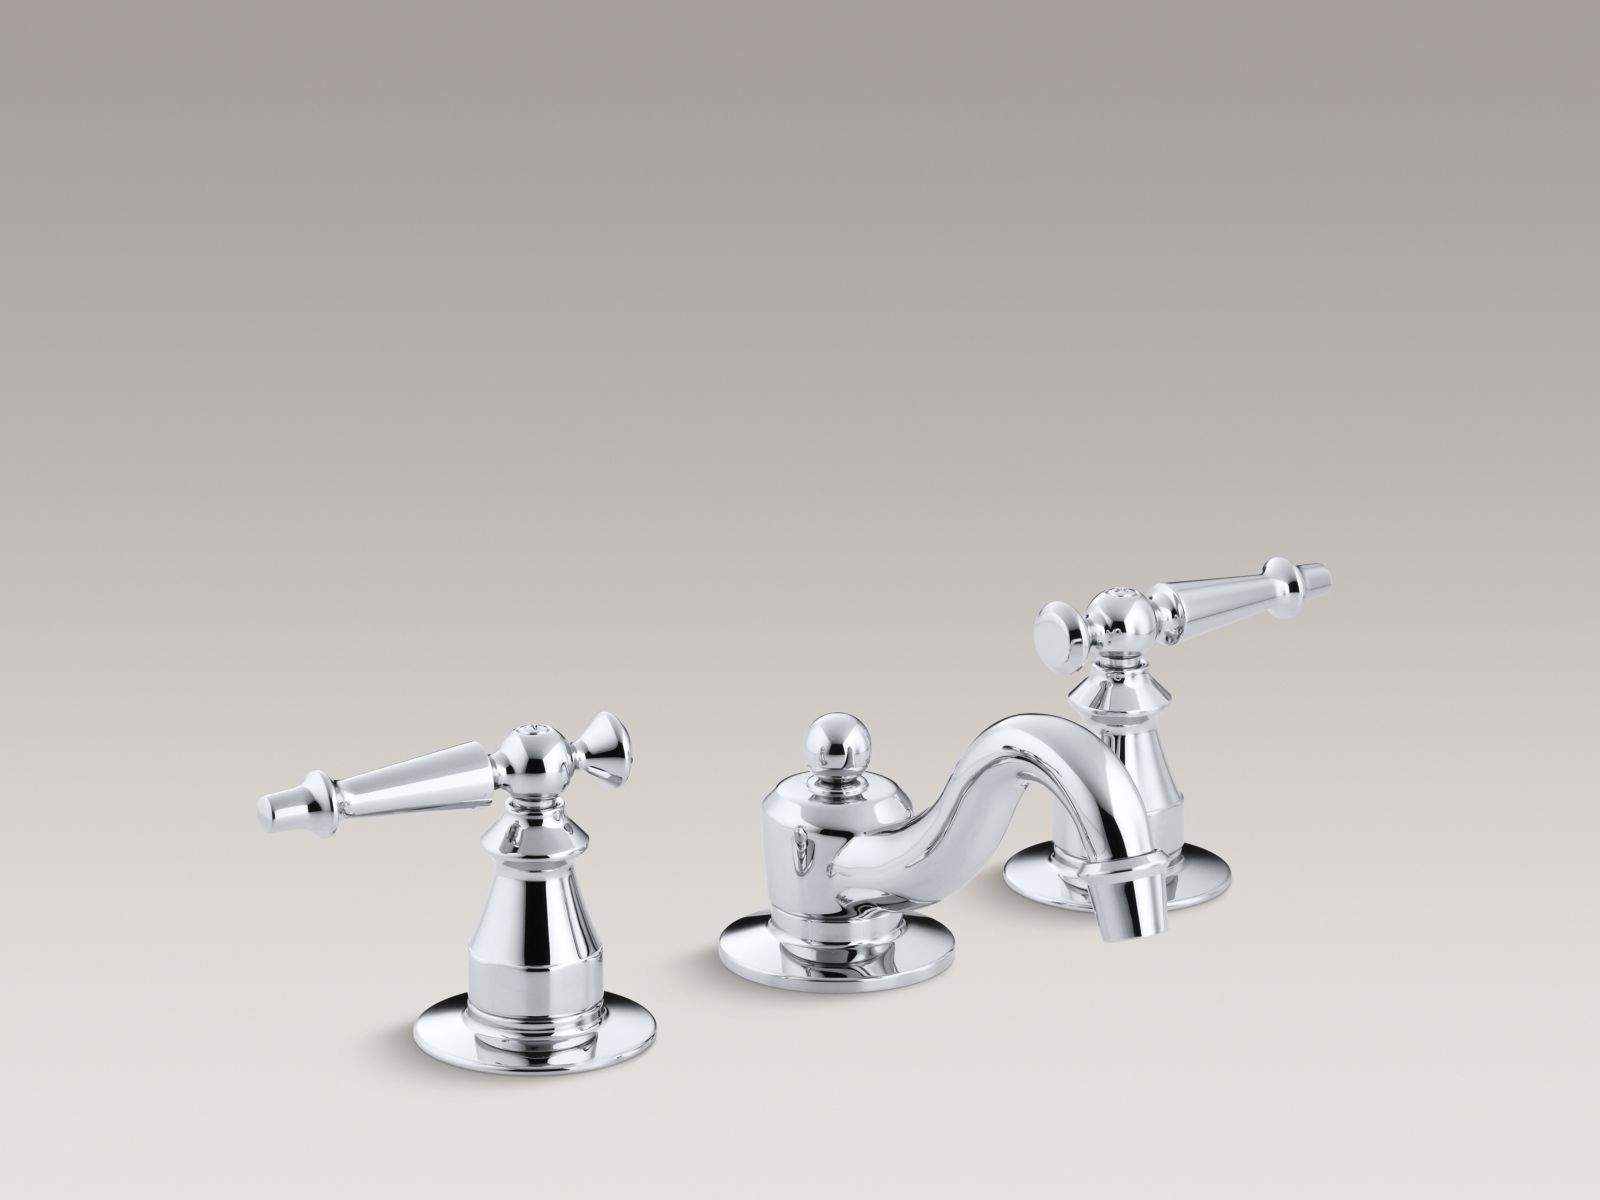 Ideas, kohler bol ceramic faucet kohler bol ceramic faucet buyplumbing category bathroom faucet 1600 x 1200 1  .